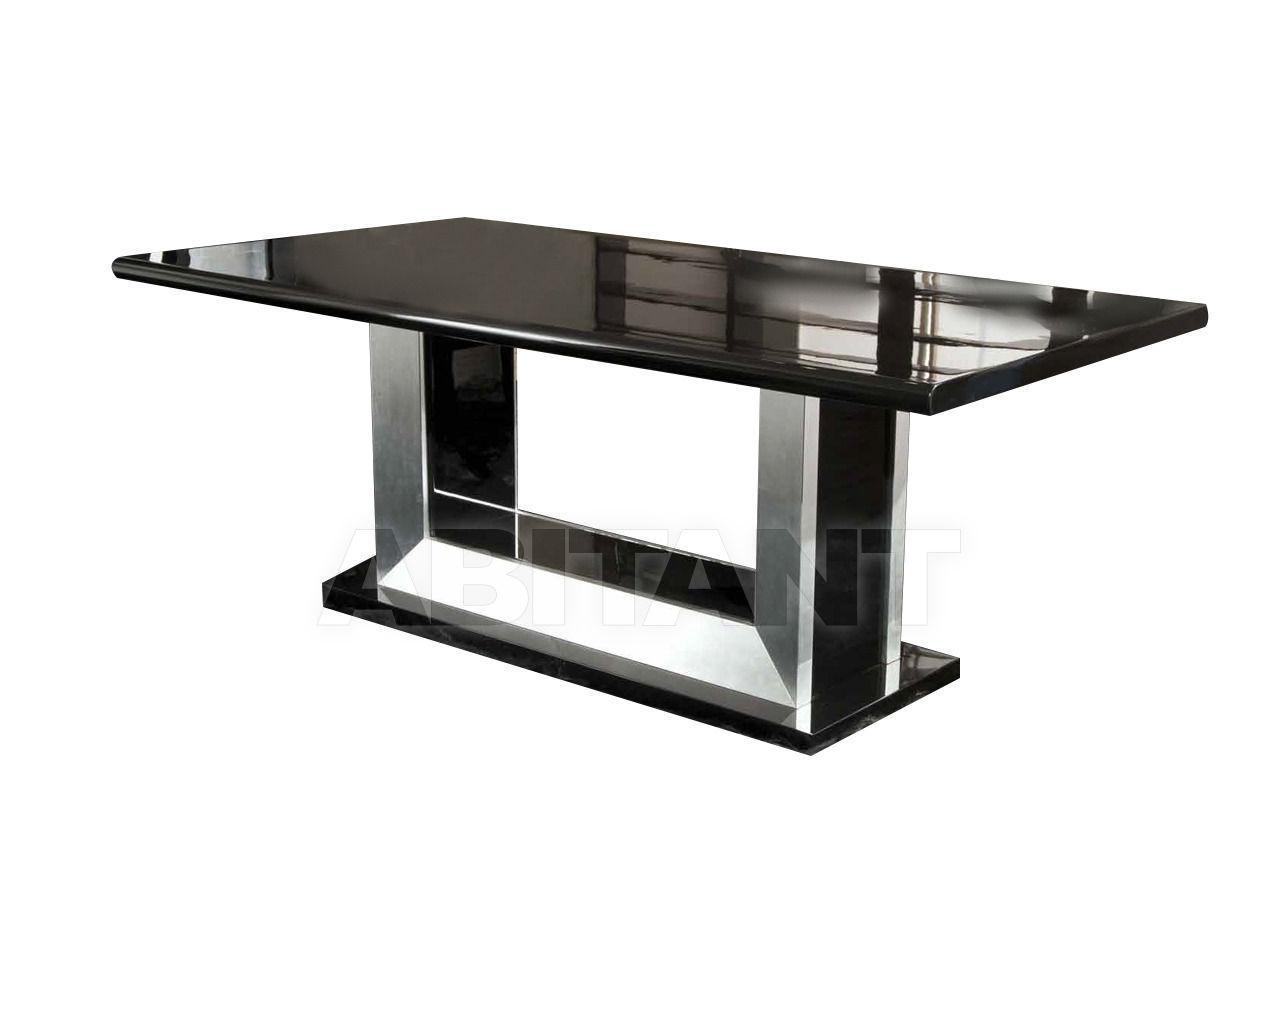 Купить Стол обеденный GC Colombo Prestige 316.004